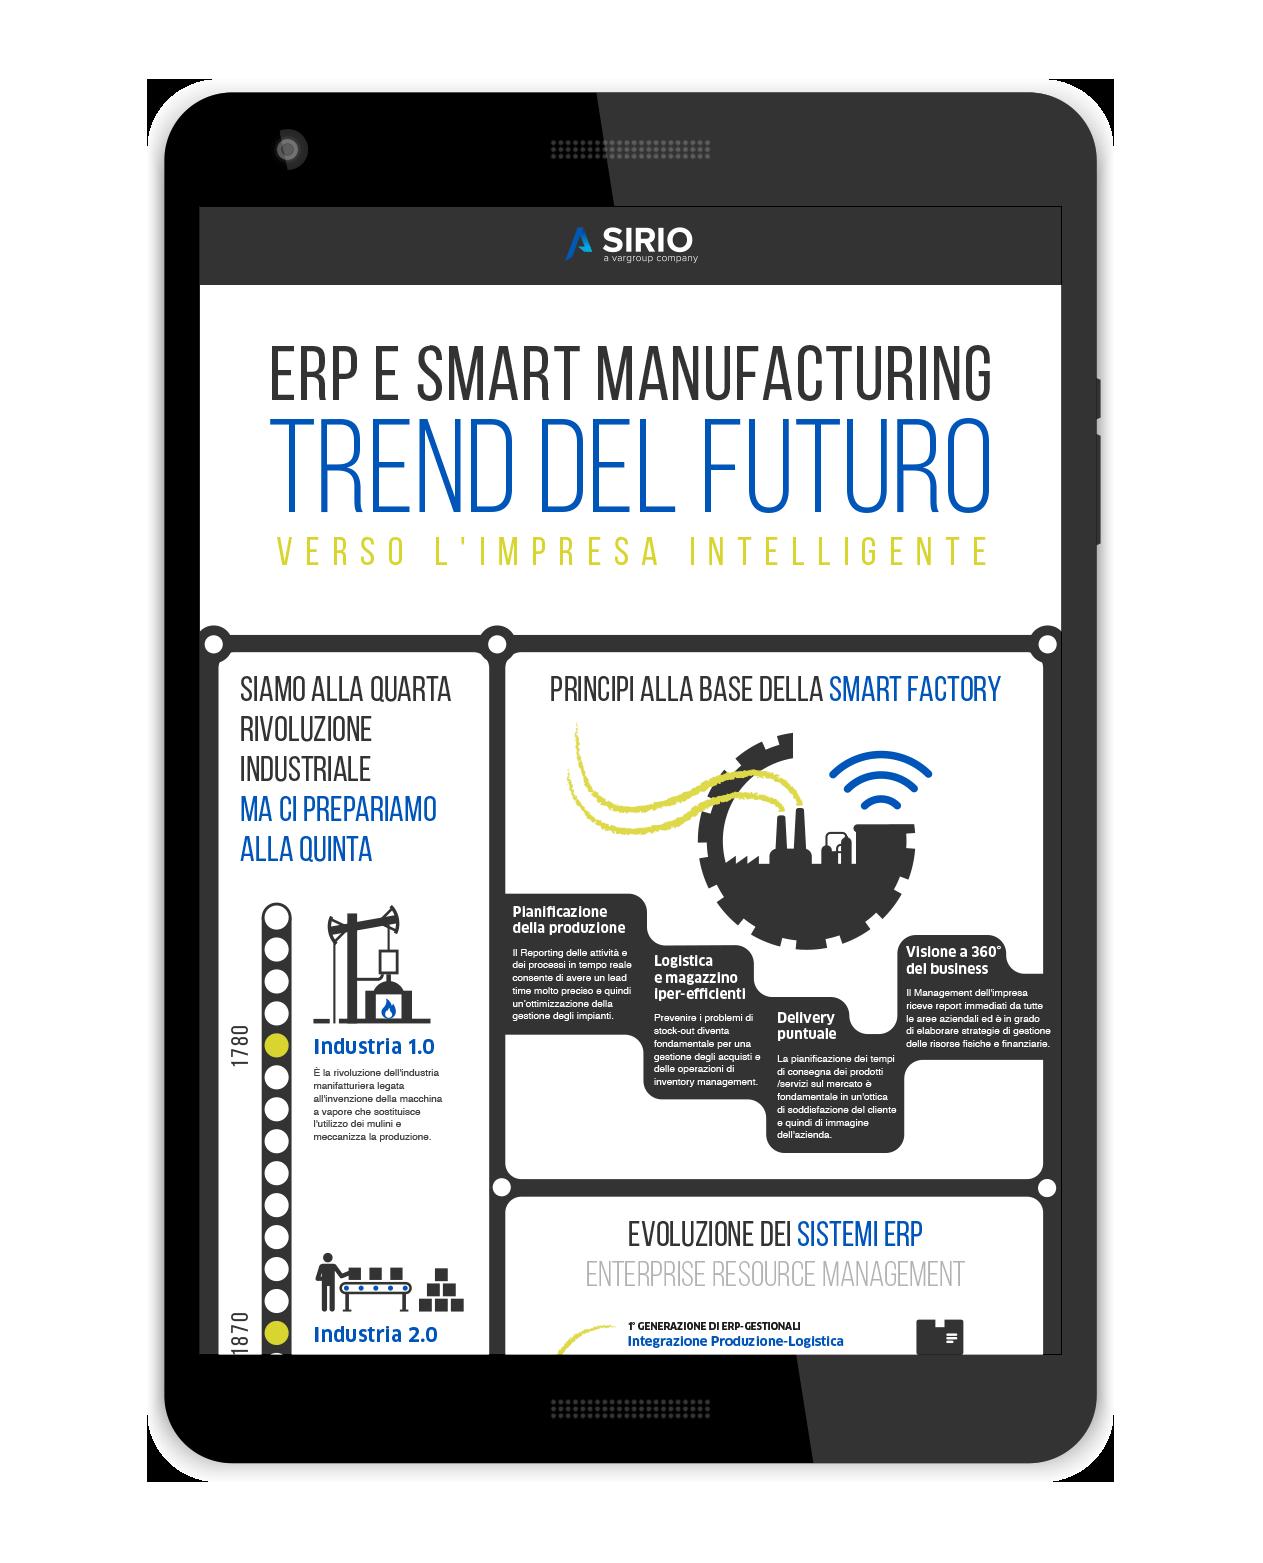 MockUp_Erp e smart manufacturing